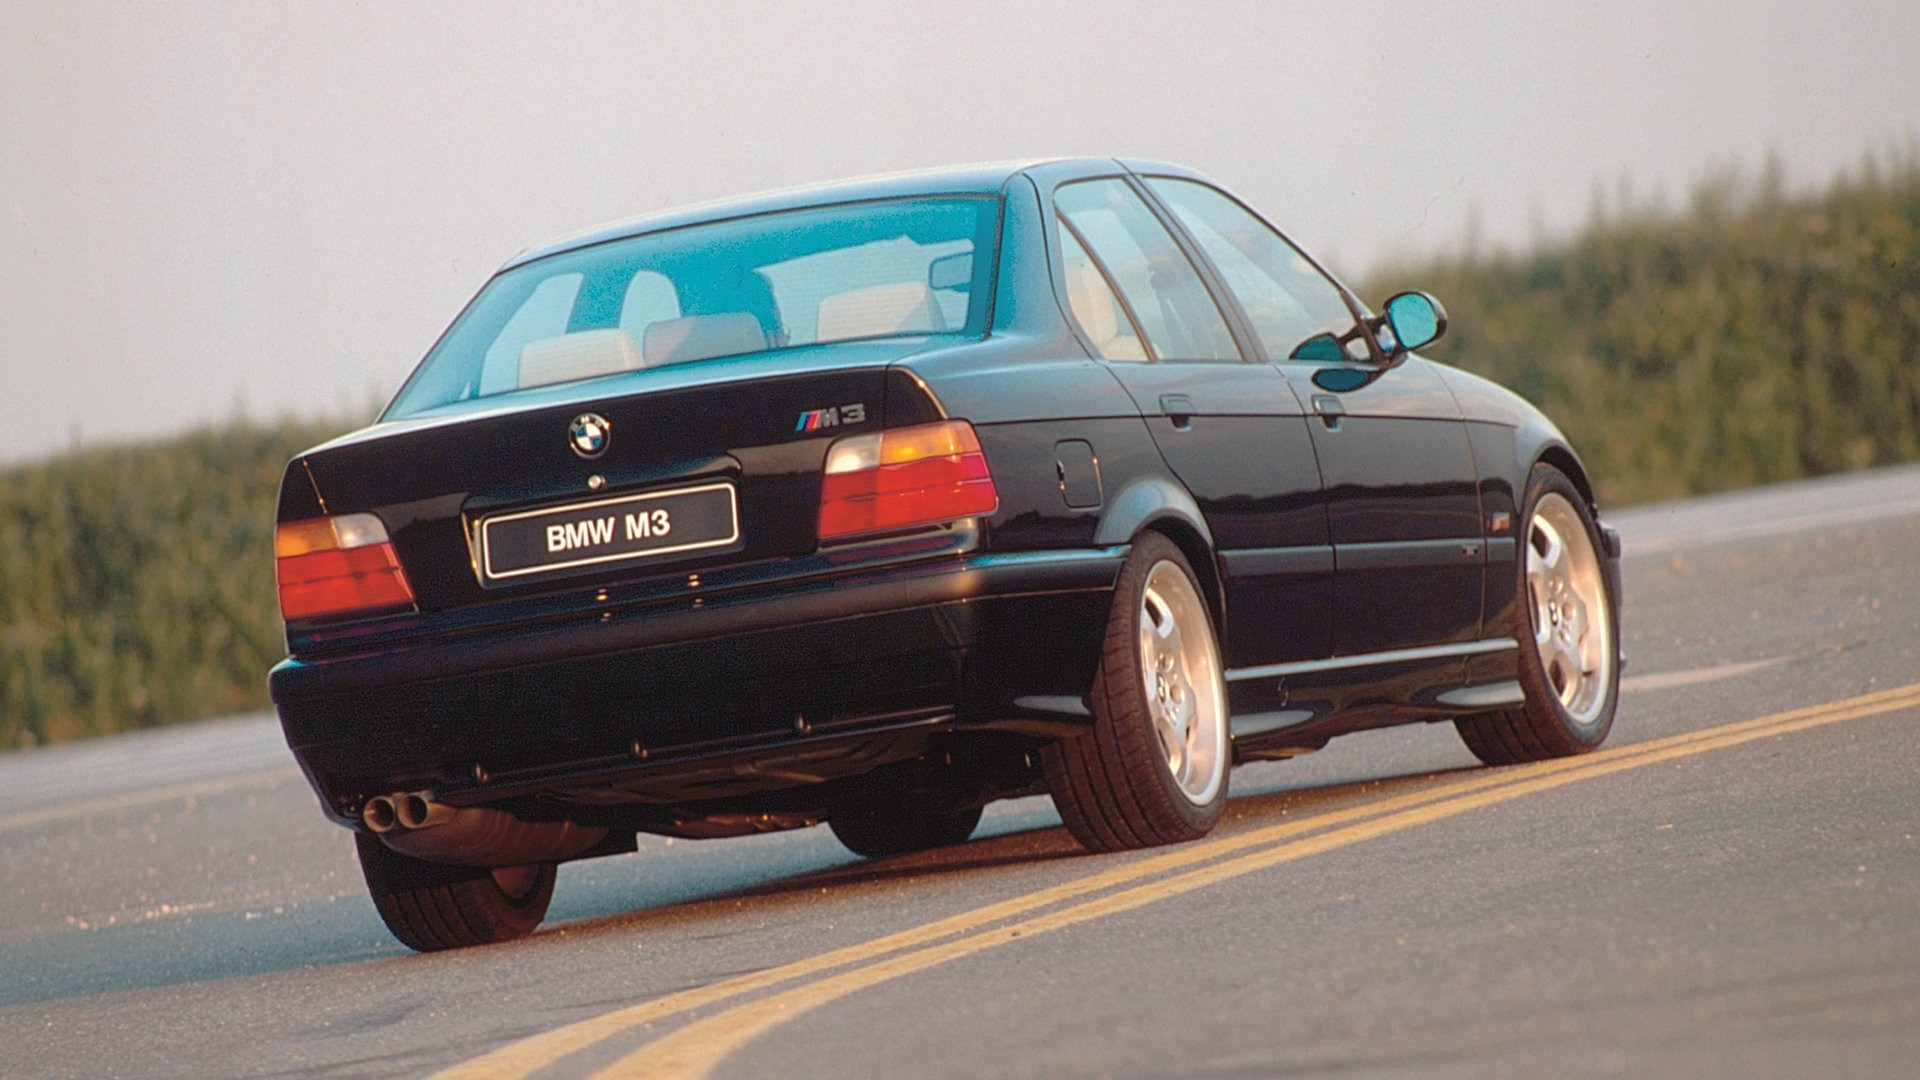 BMW M3 E36 sedan